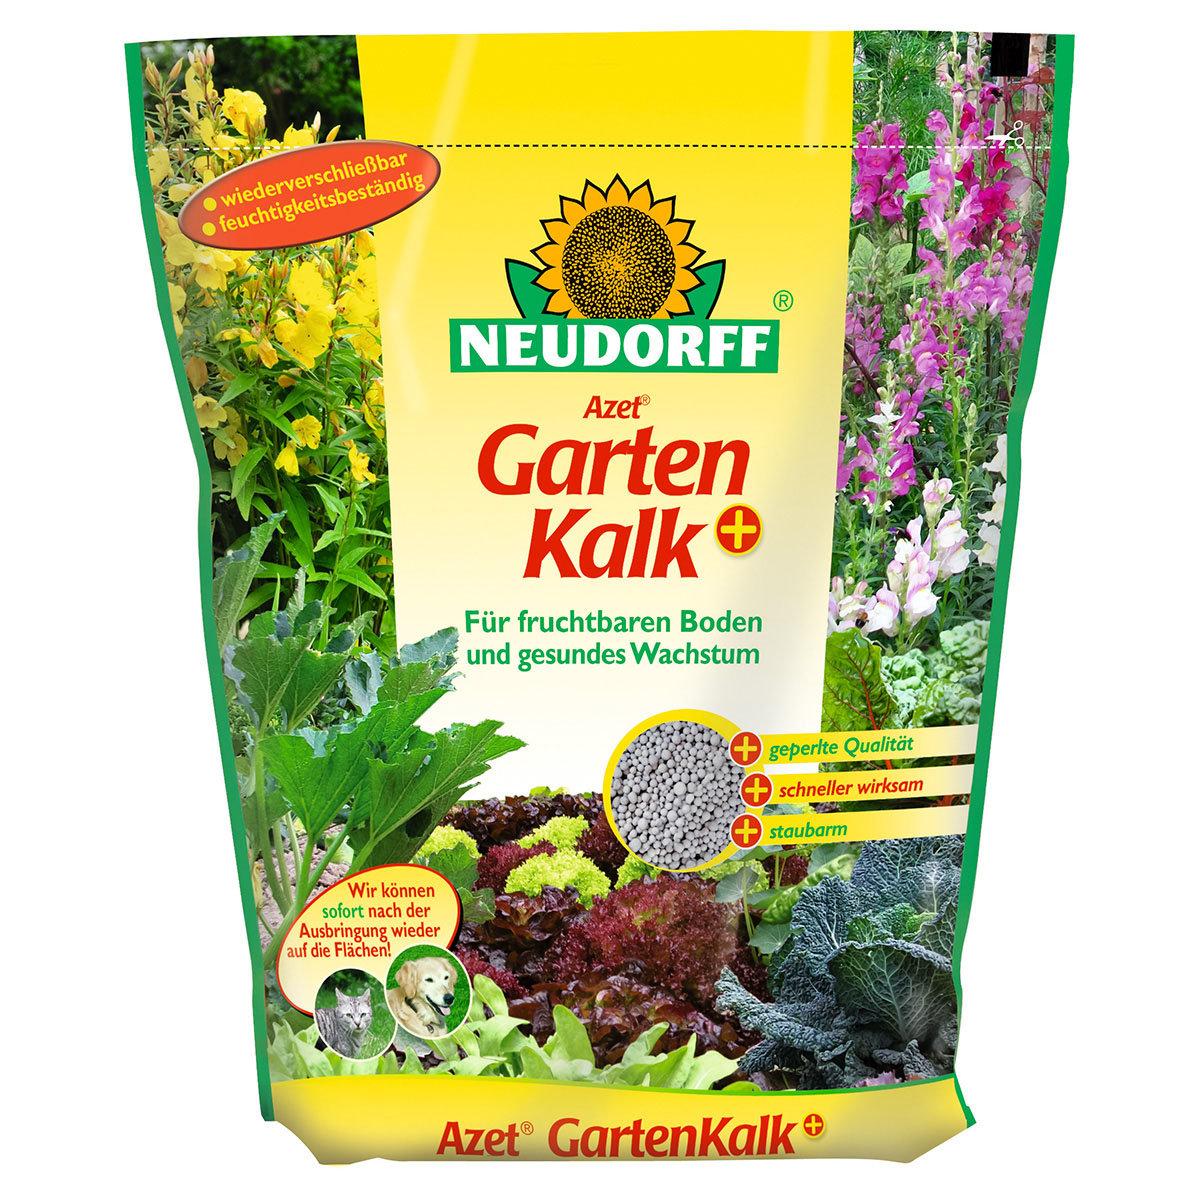 Neudorff Azet GartenKalk+, 2,5 kg